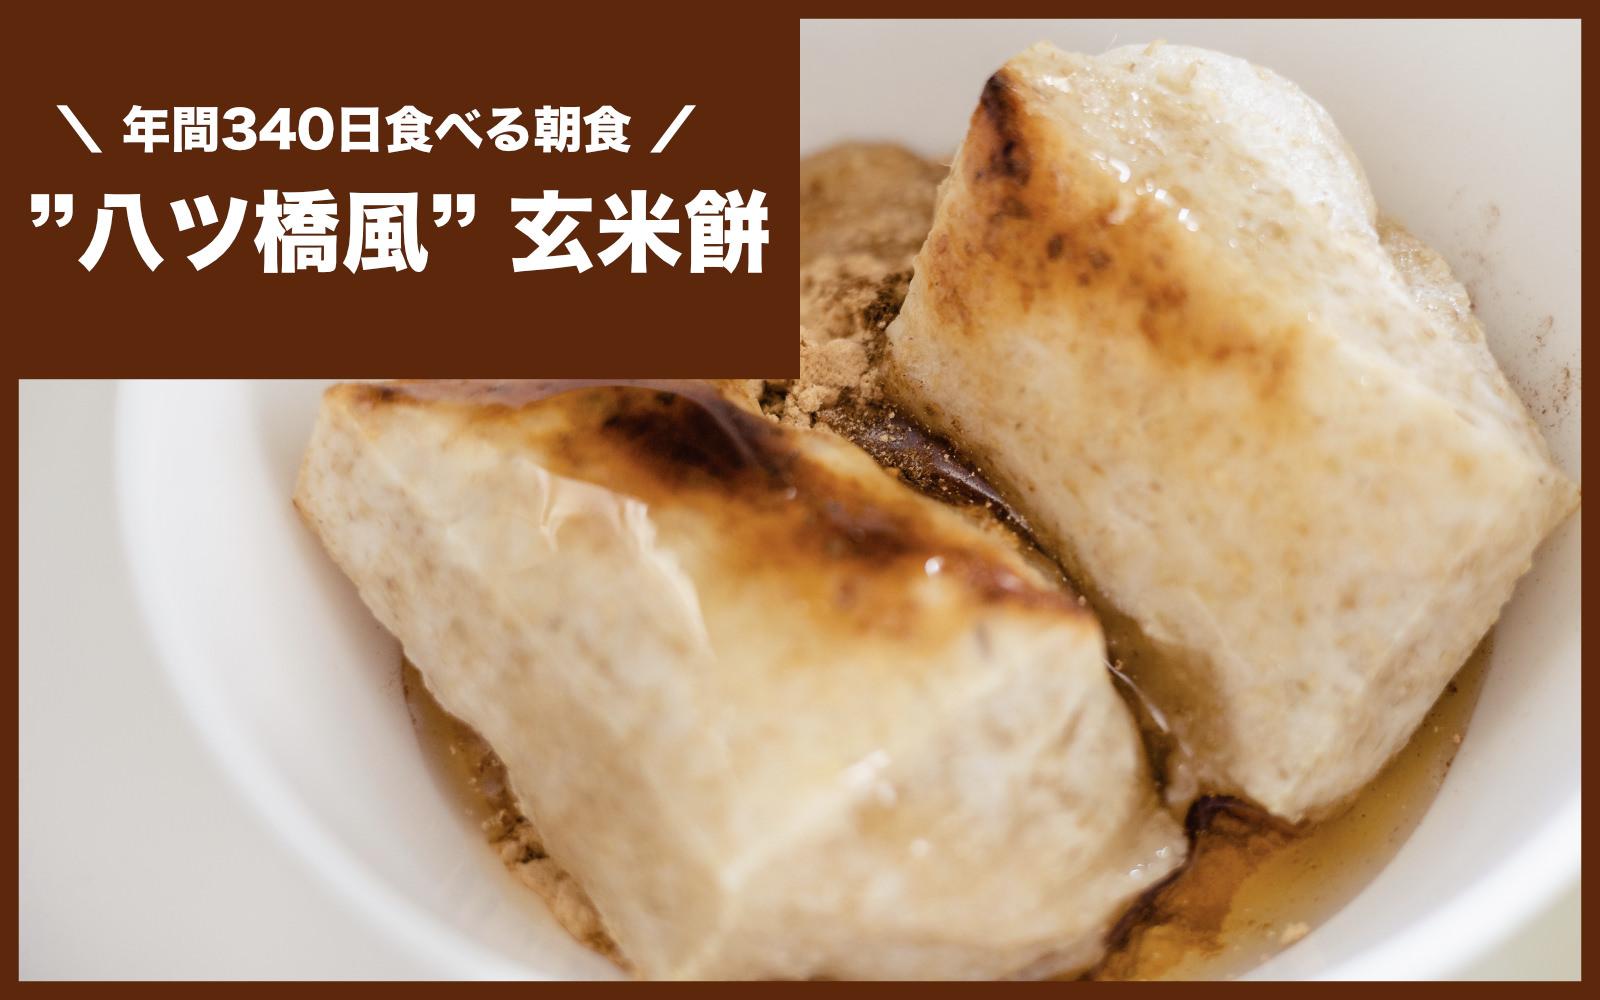 Yatsuhashi-Genmai-Mochi-Gorime.jpg